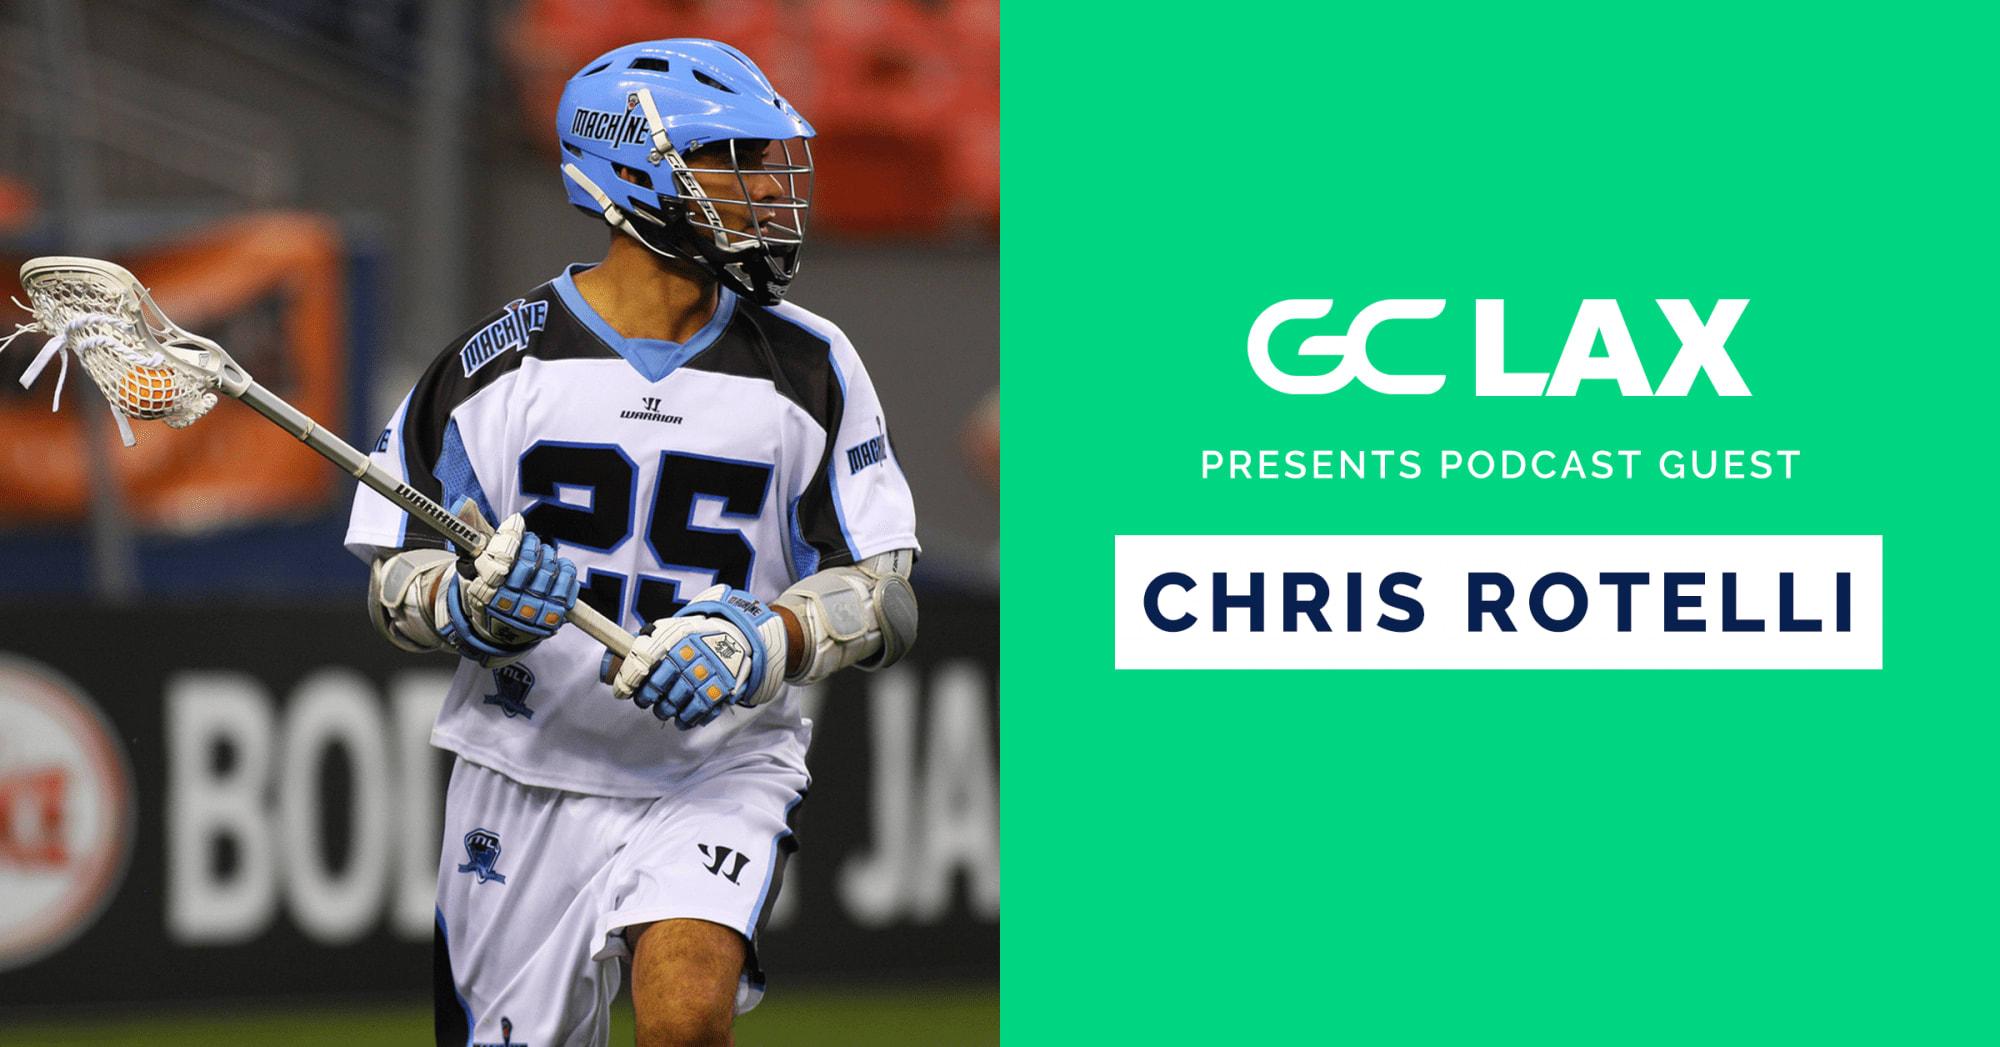 GCLax Podcast Chris Rotelli